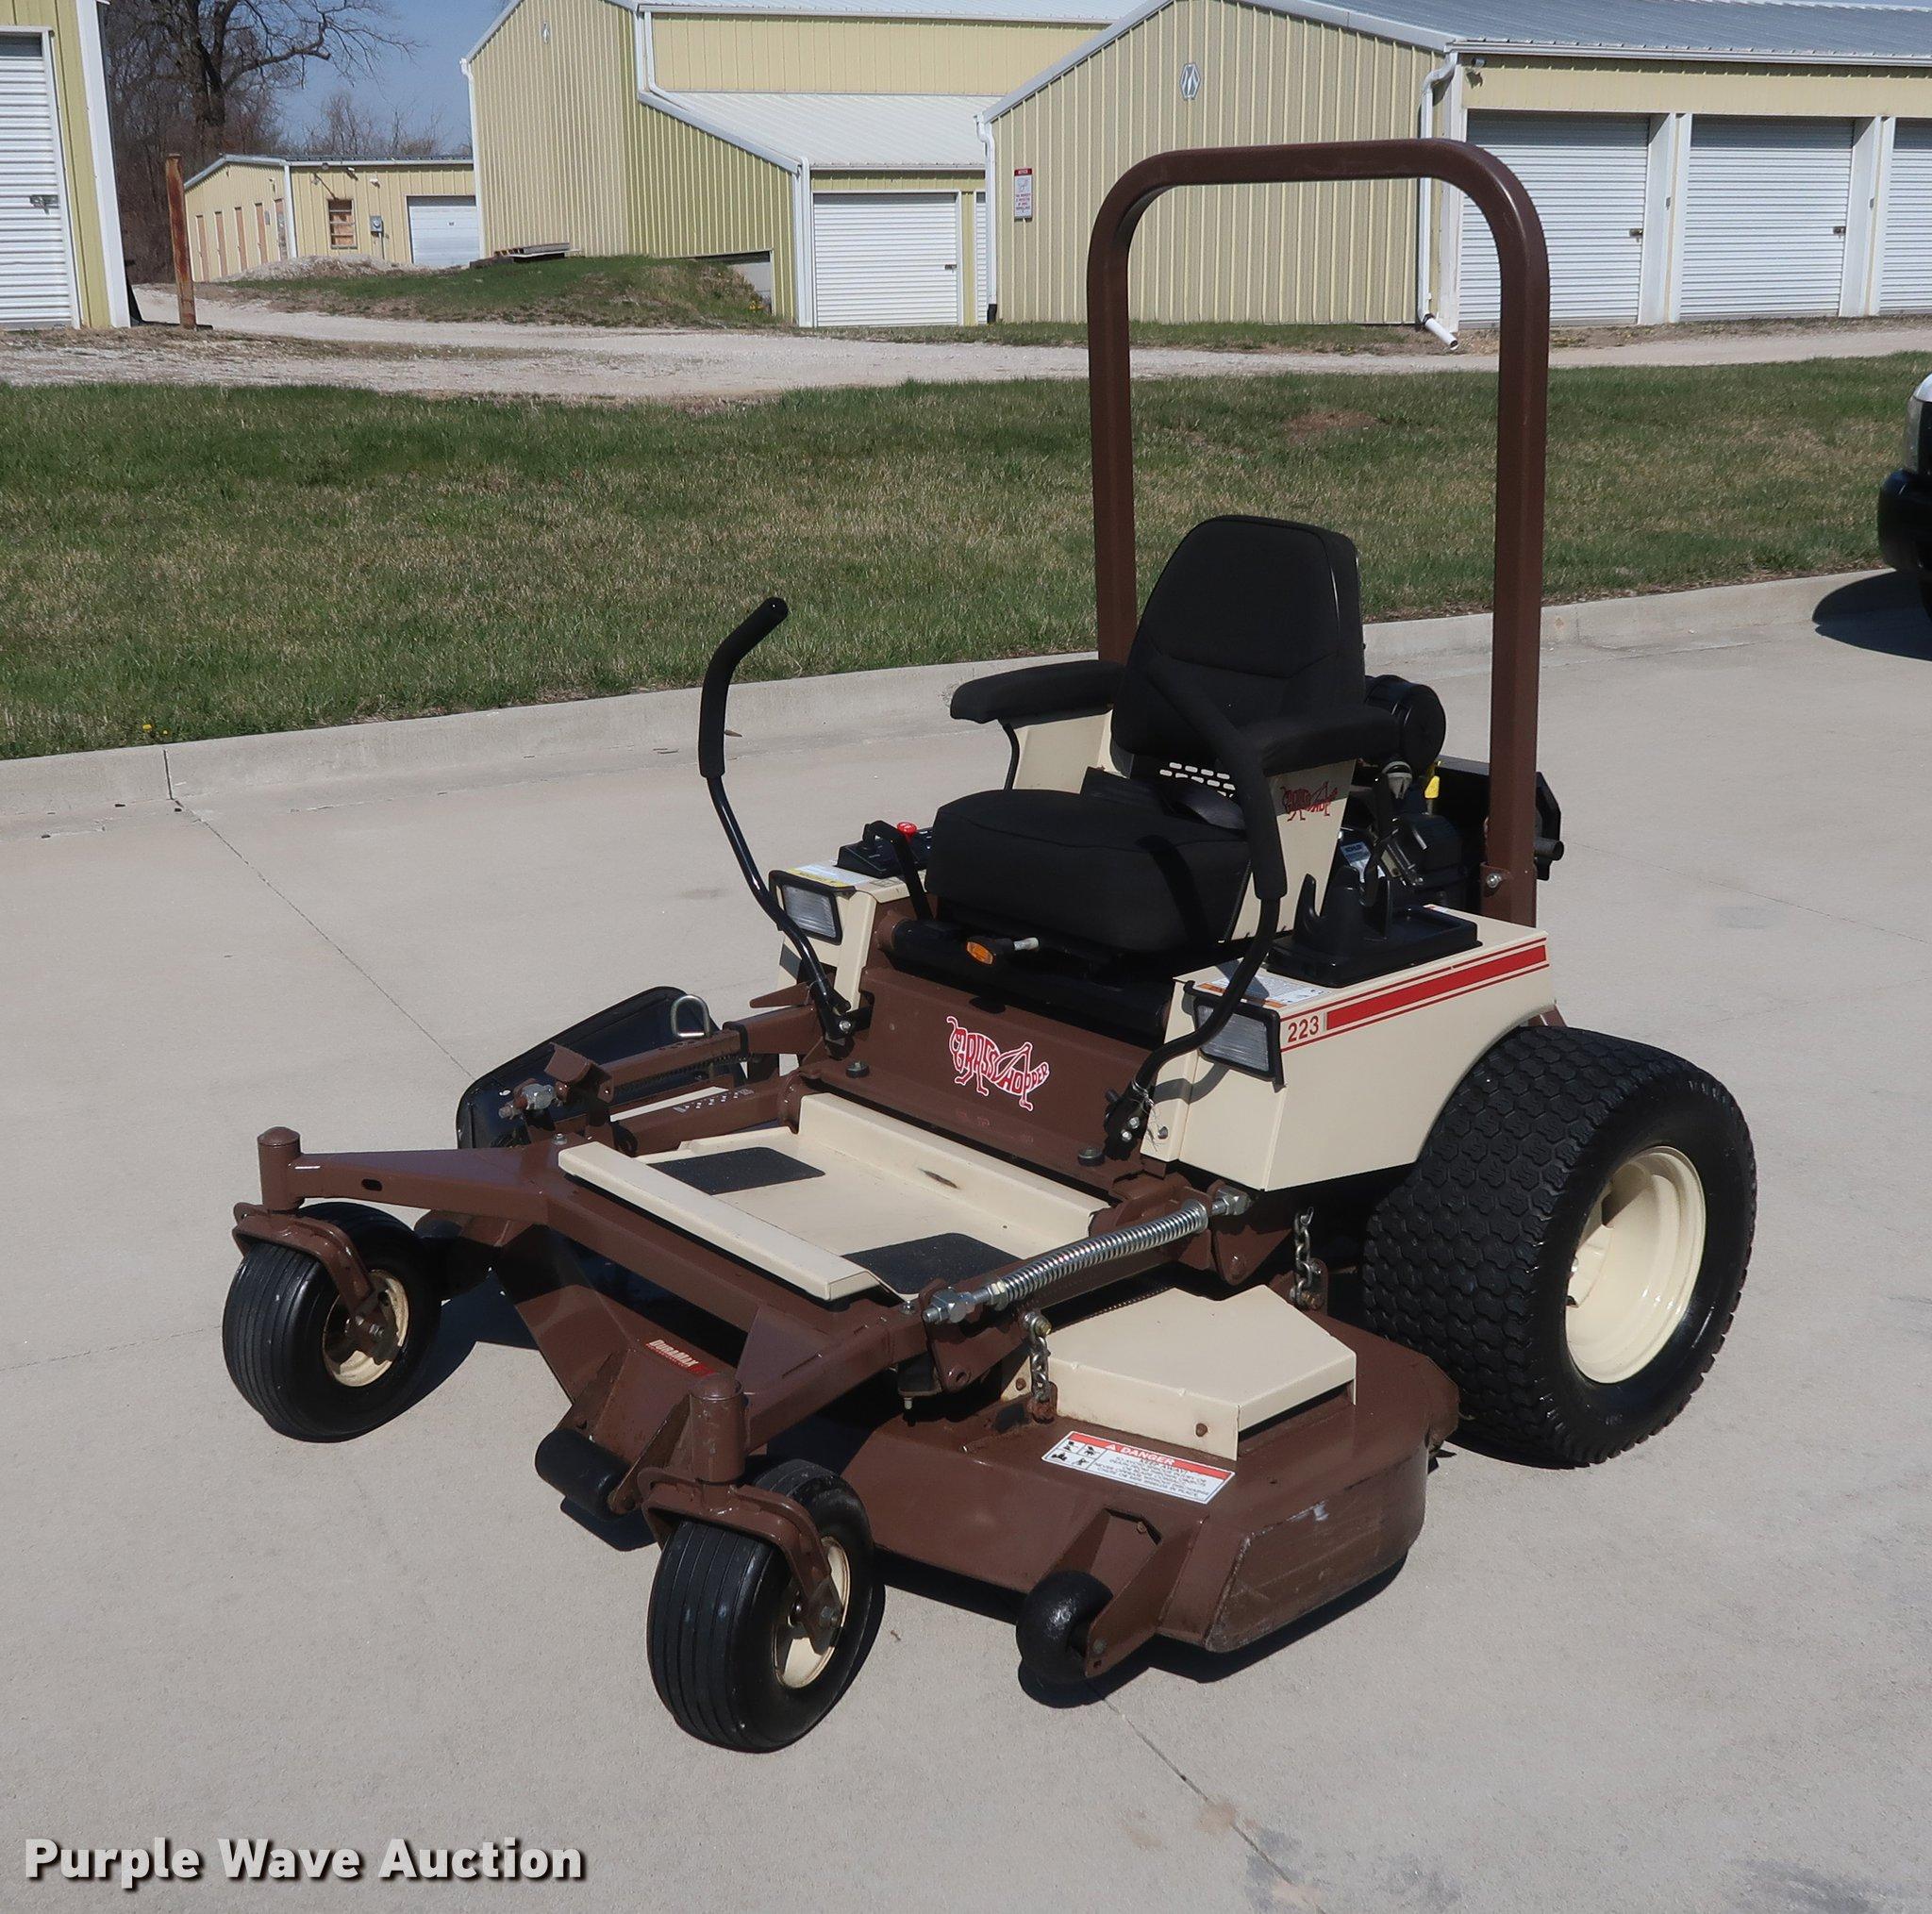 Grasshopper 223 ZTR lawn mower | Item EL9296 | SOLD! May 2 V